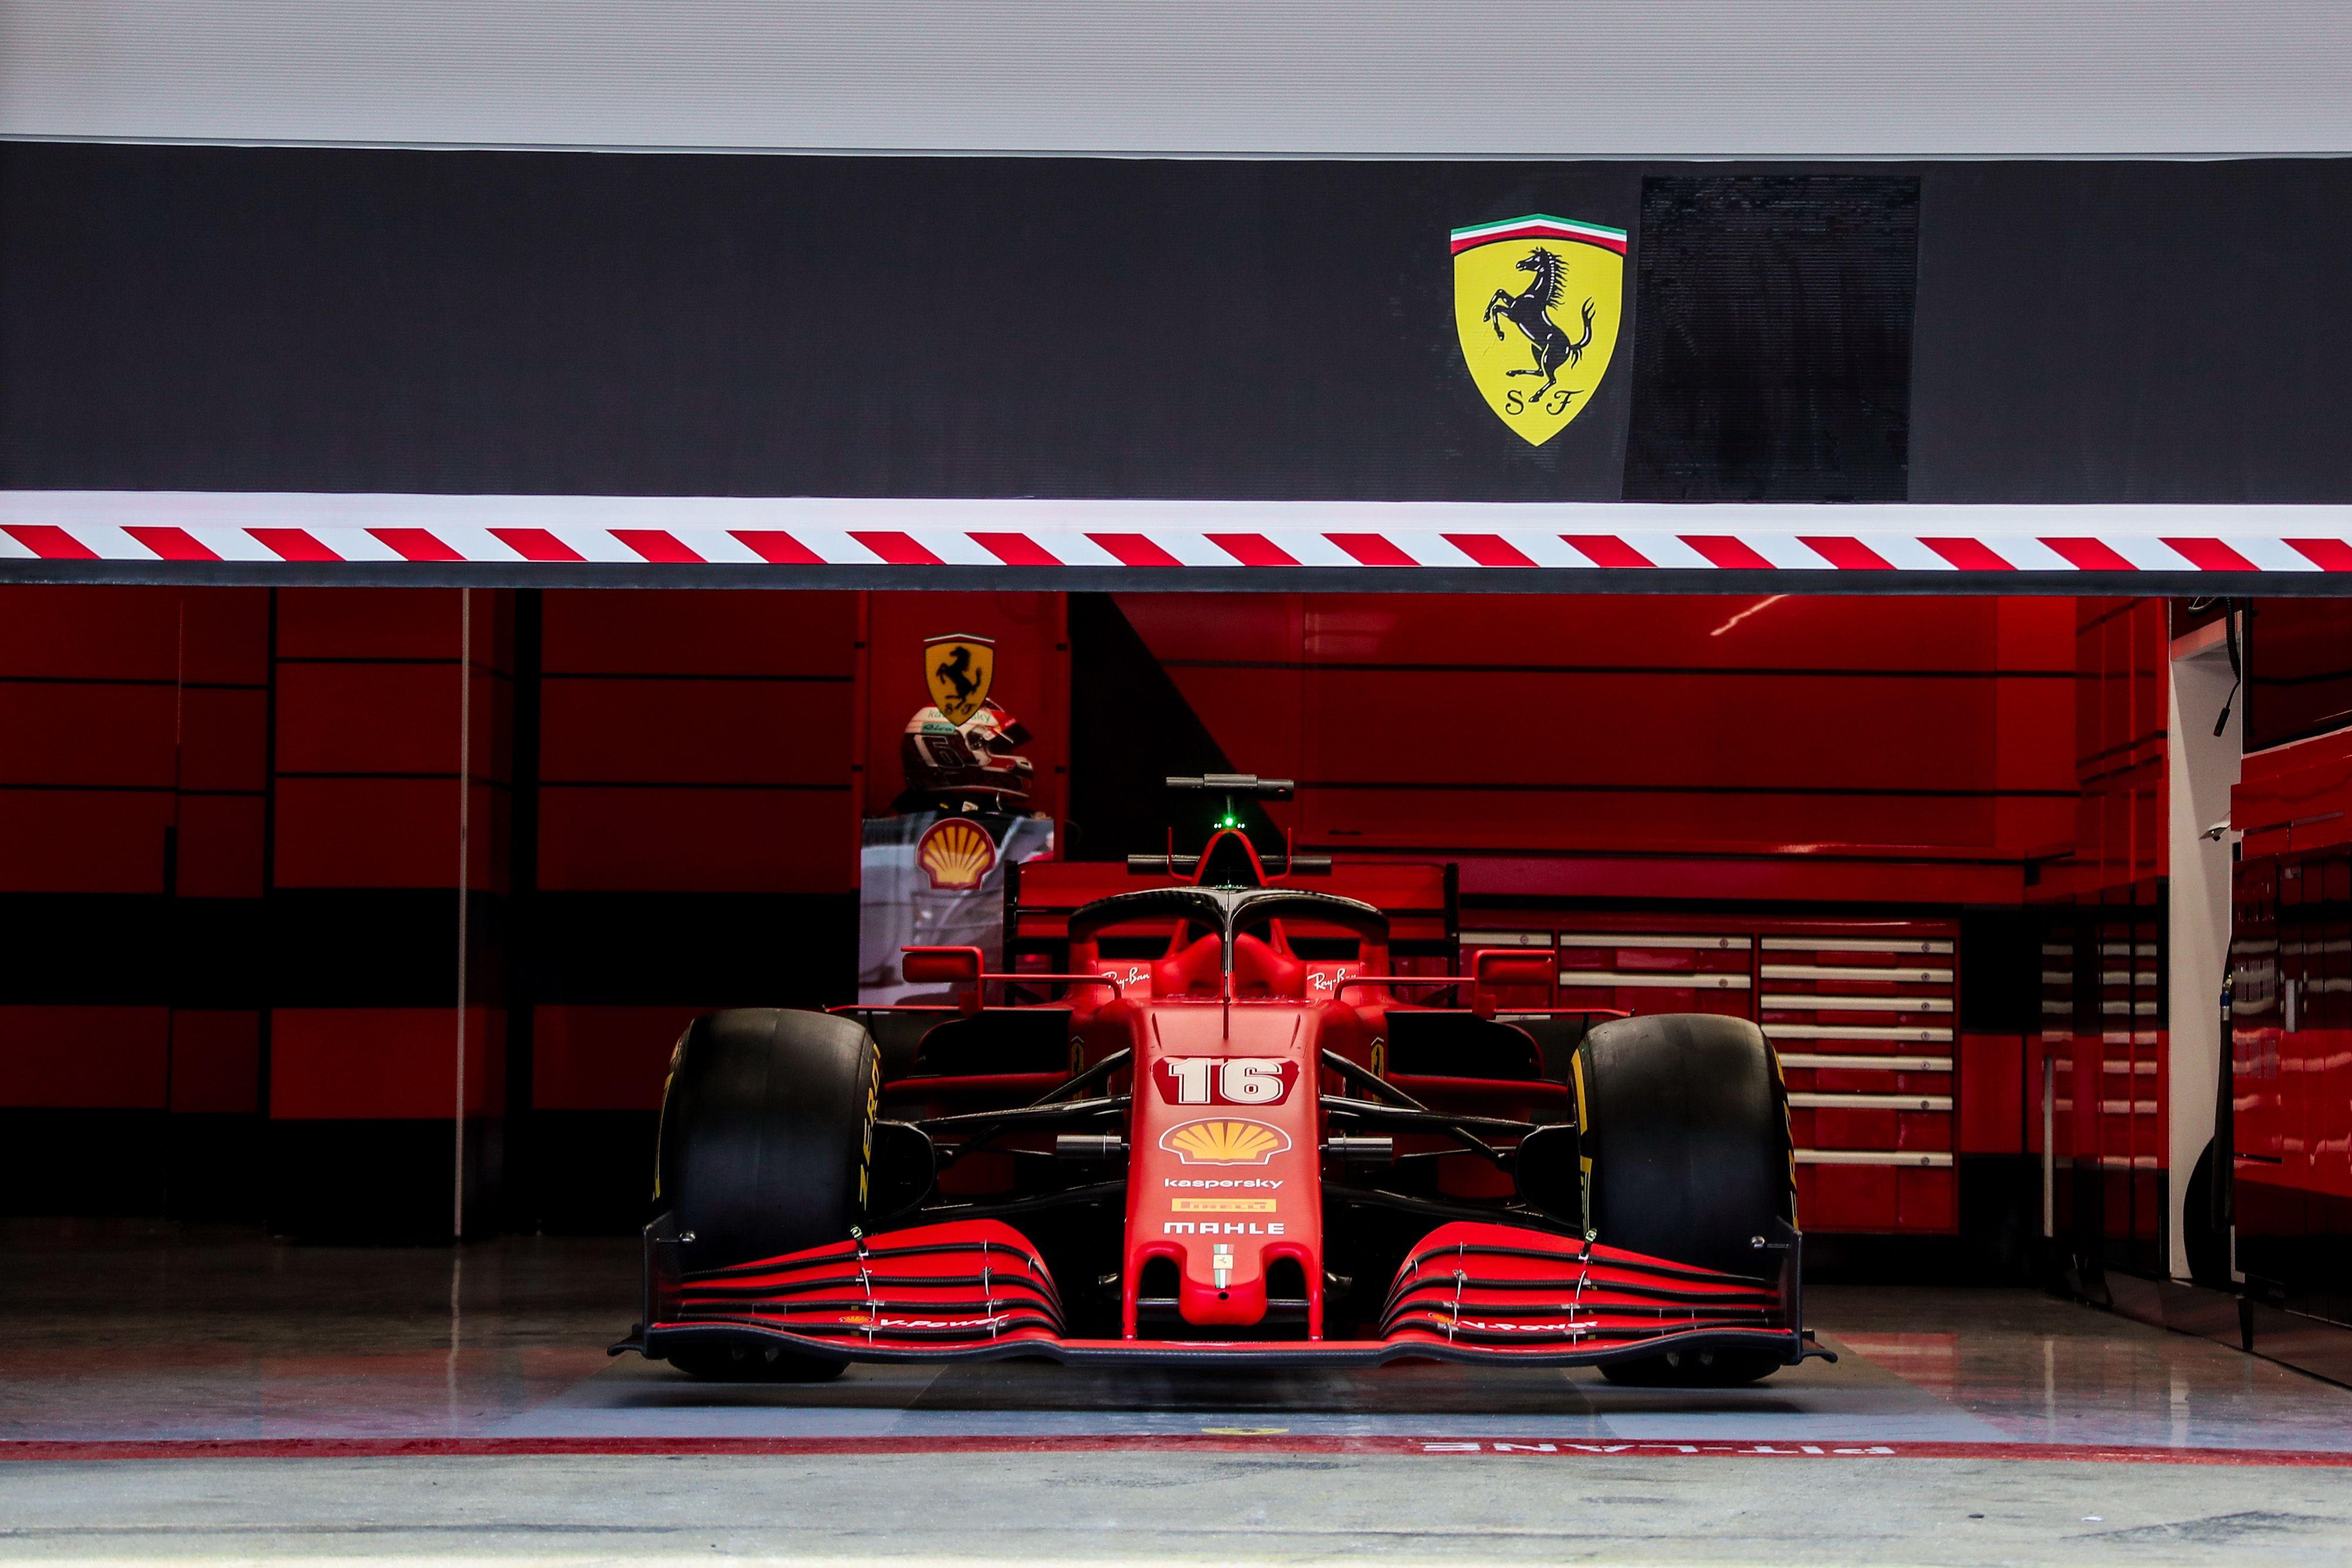 Ferrari Y La Carrera En Las Antipodas En 2020 Ferrari Carreras Formula 1